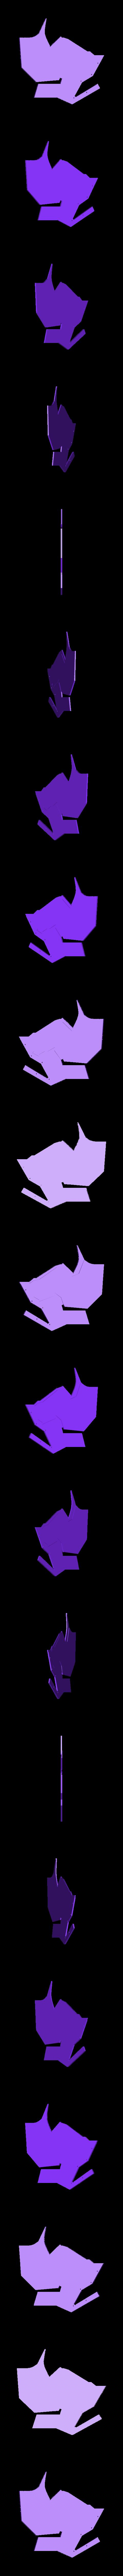 Blade_Left_2.stl Download free STL file Guardian Shield+ Zelda Breath of the Wild • 3D print object, Adafruit